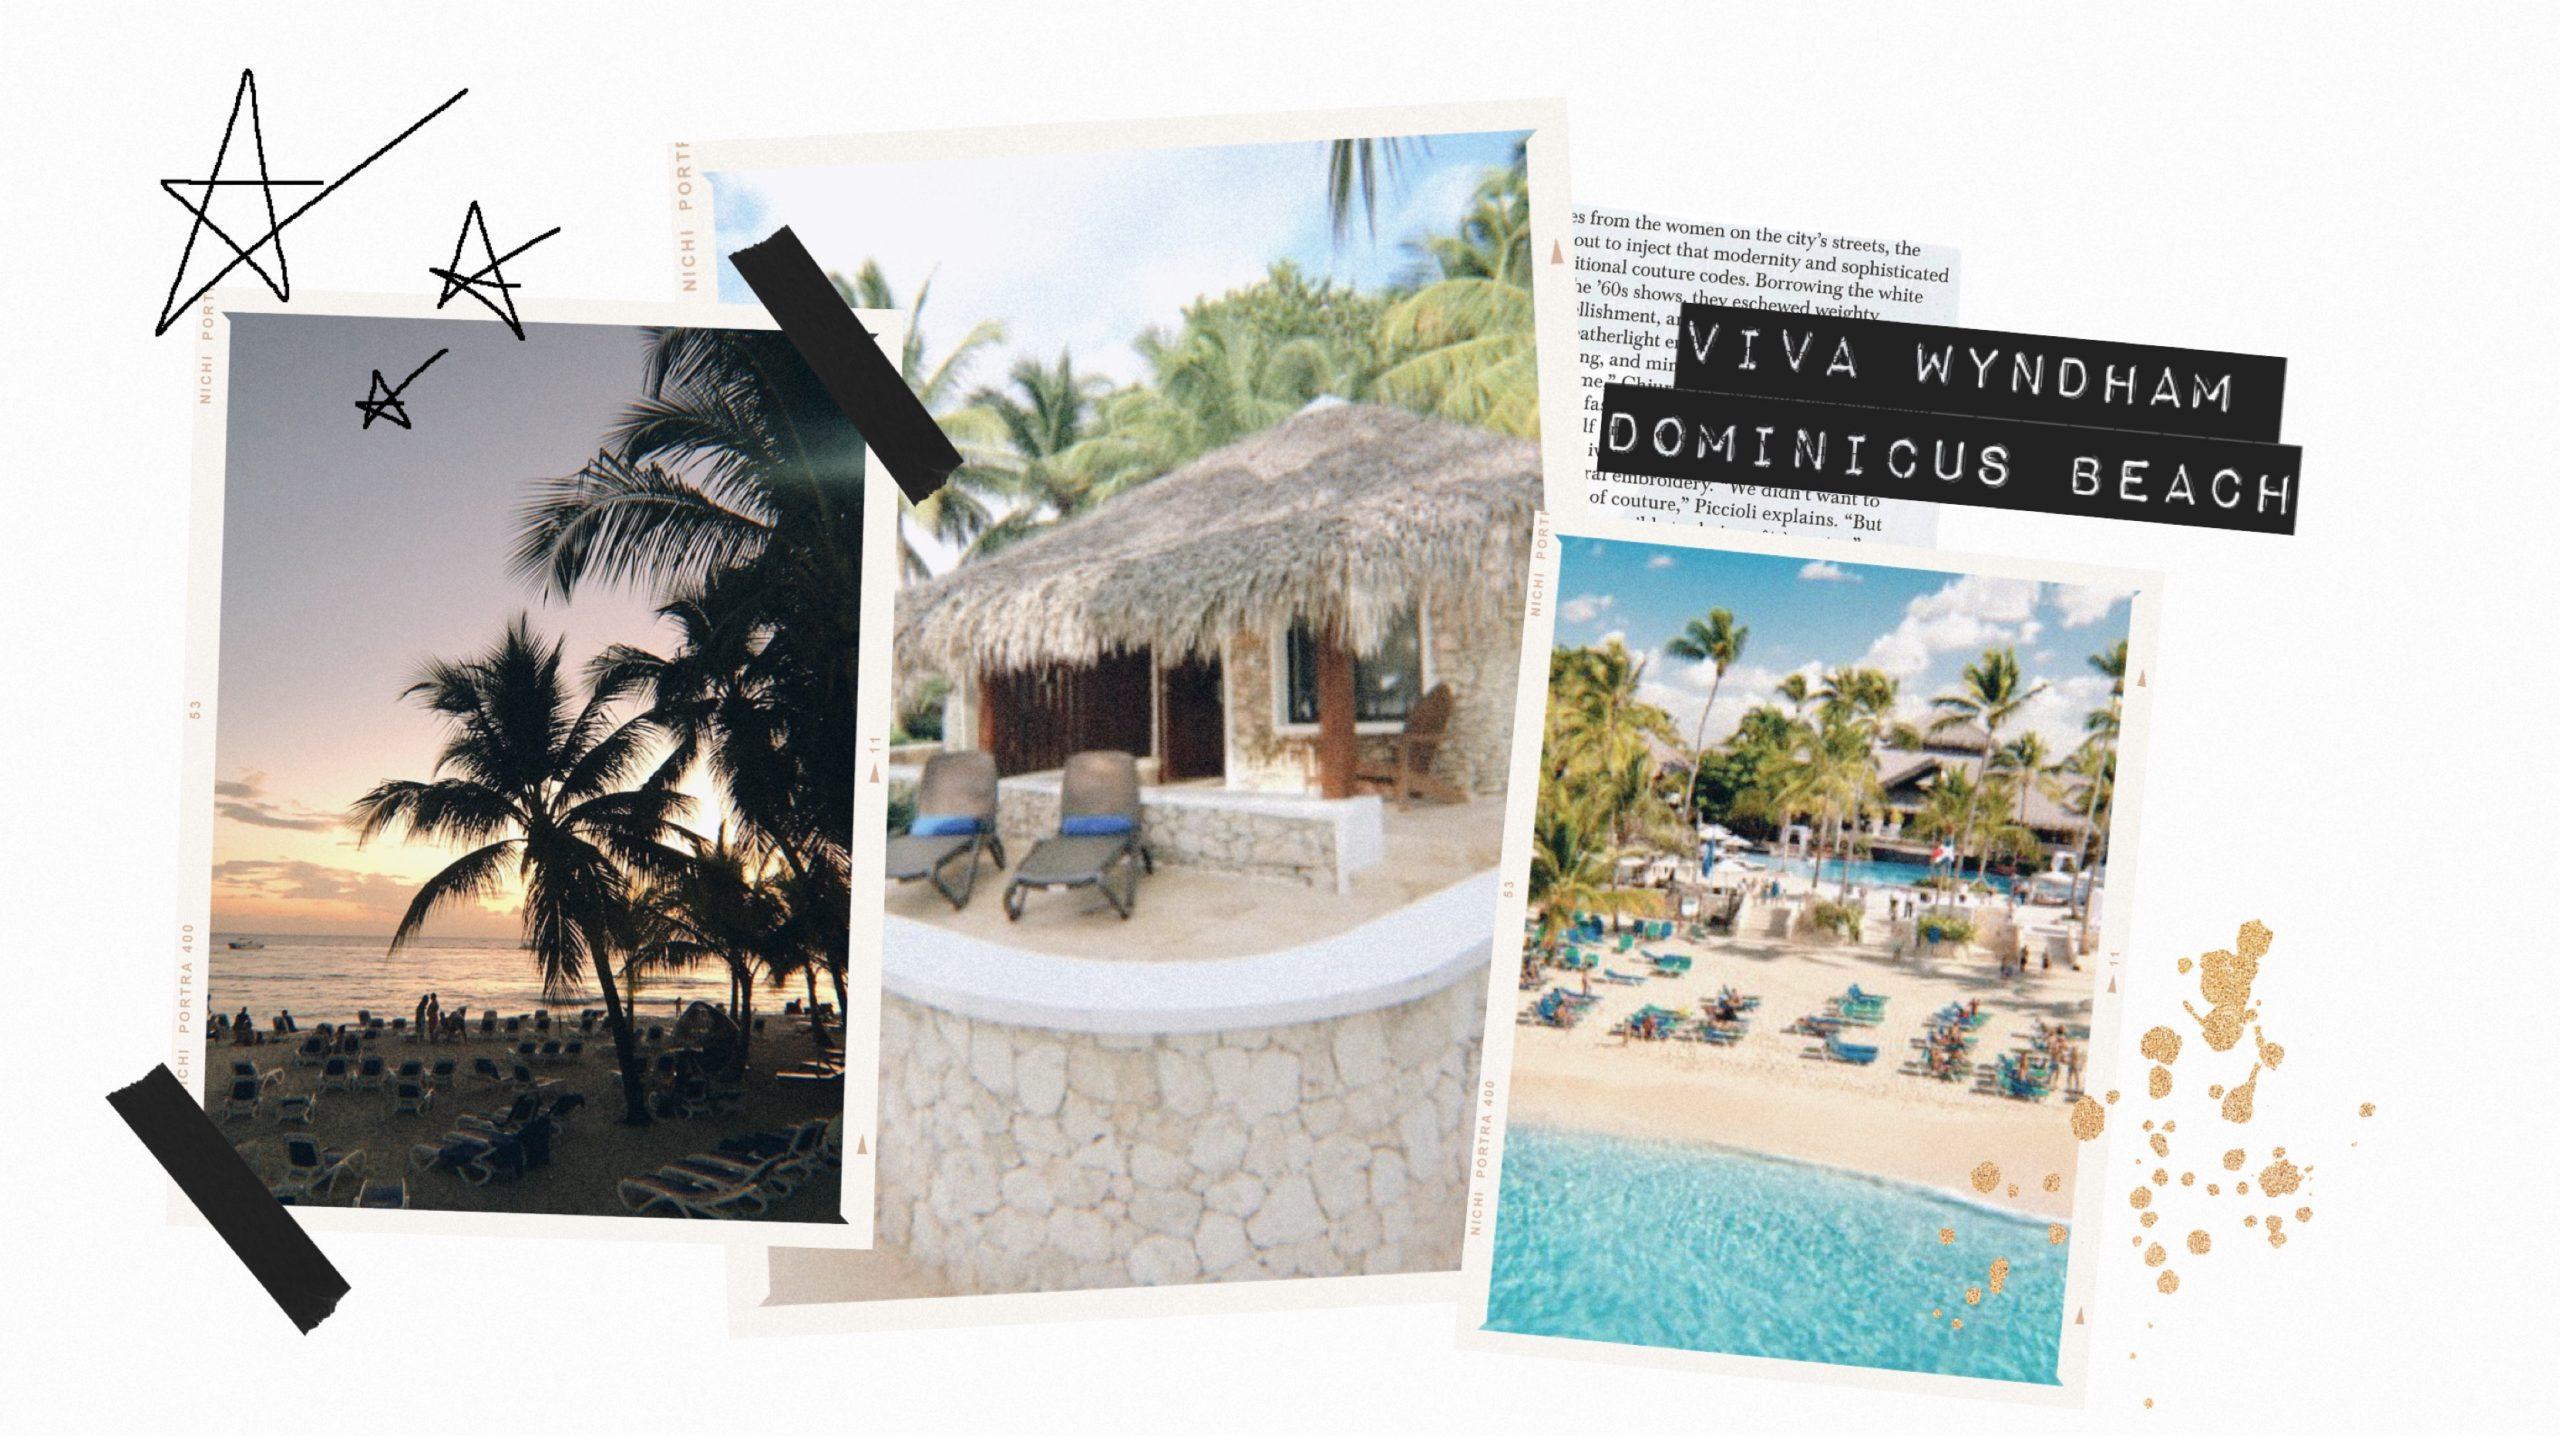 république dominicaine hotel viva wyndham dominicus beach